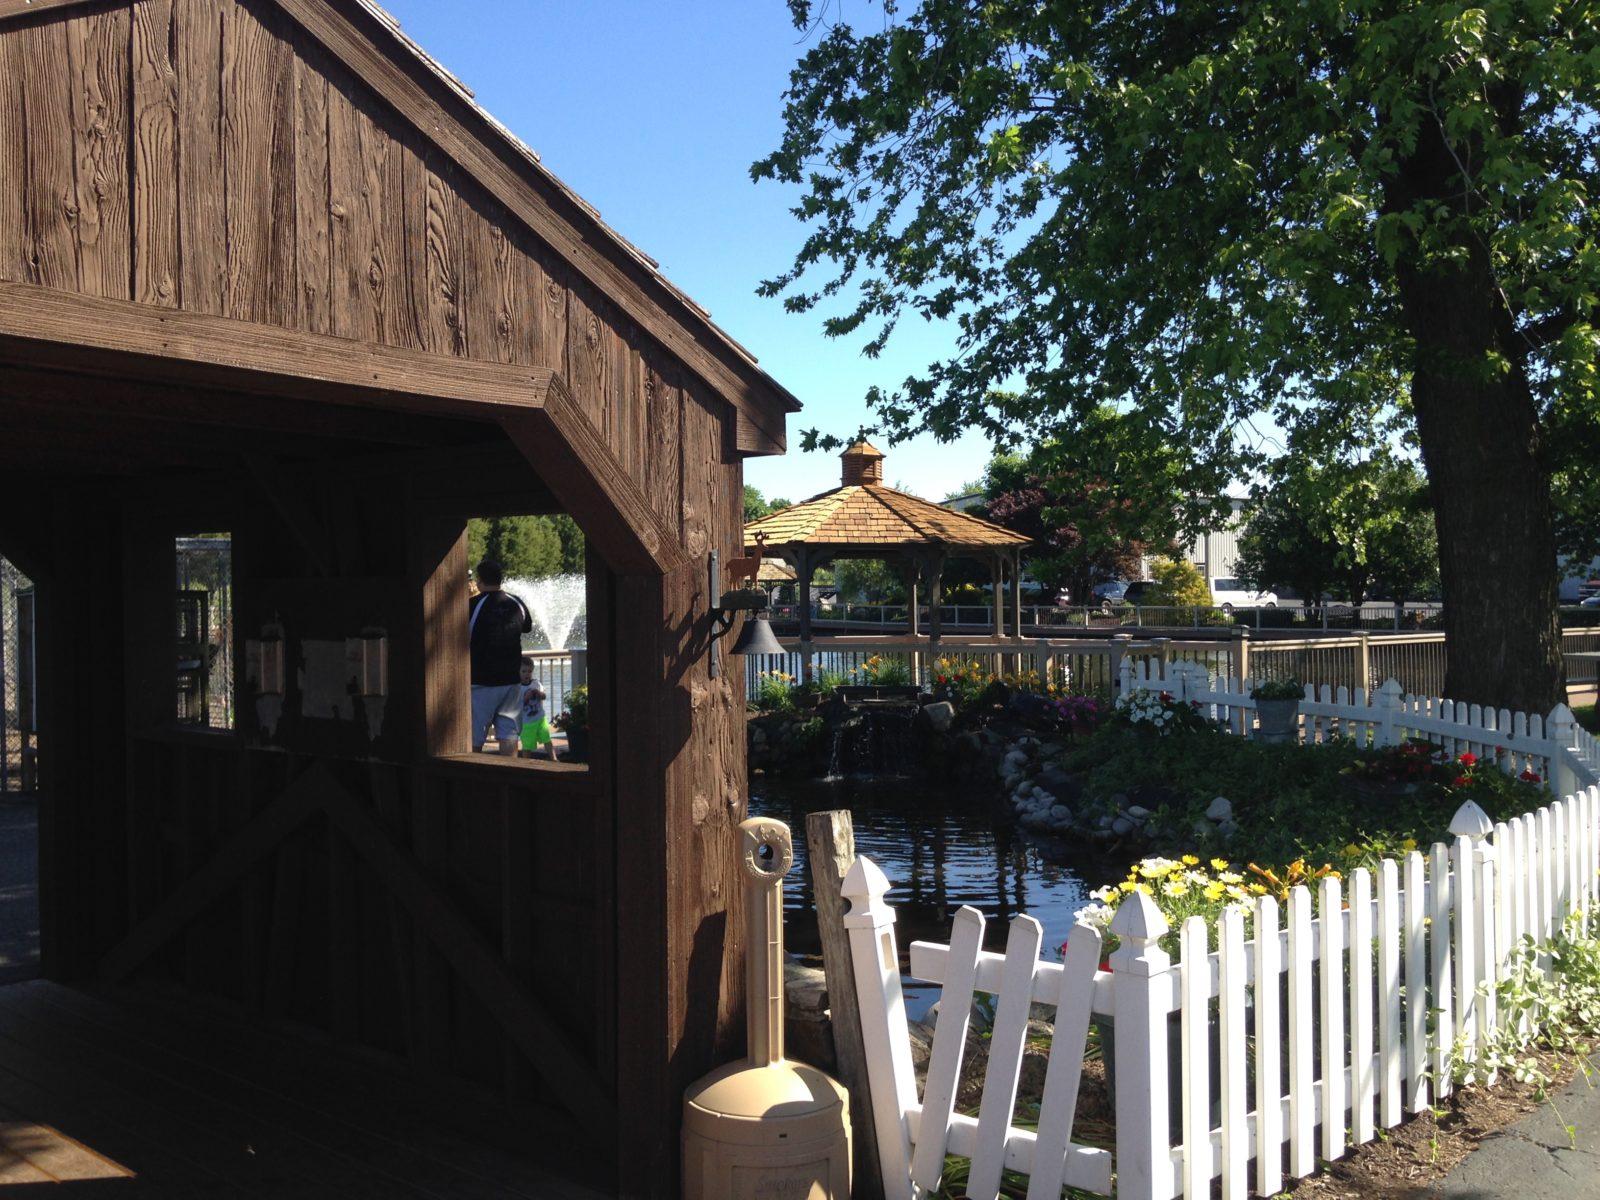 Hayloft Petting Zoo in Leola, PA - Frugal Lancaster